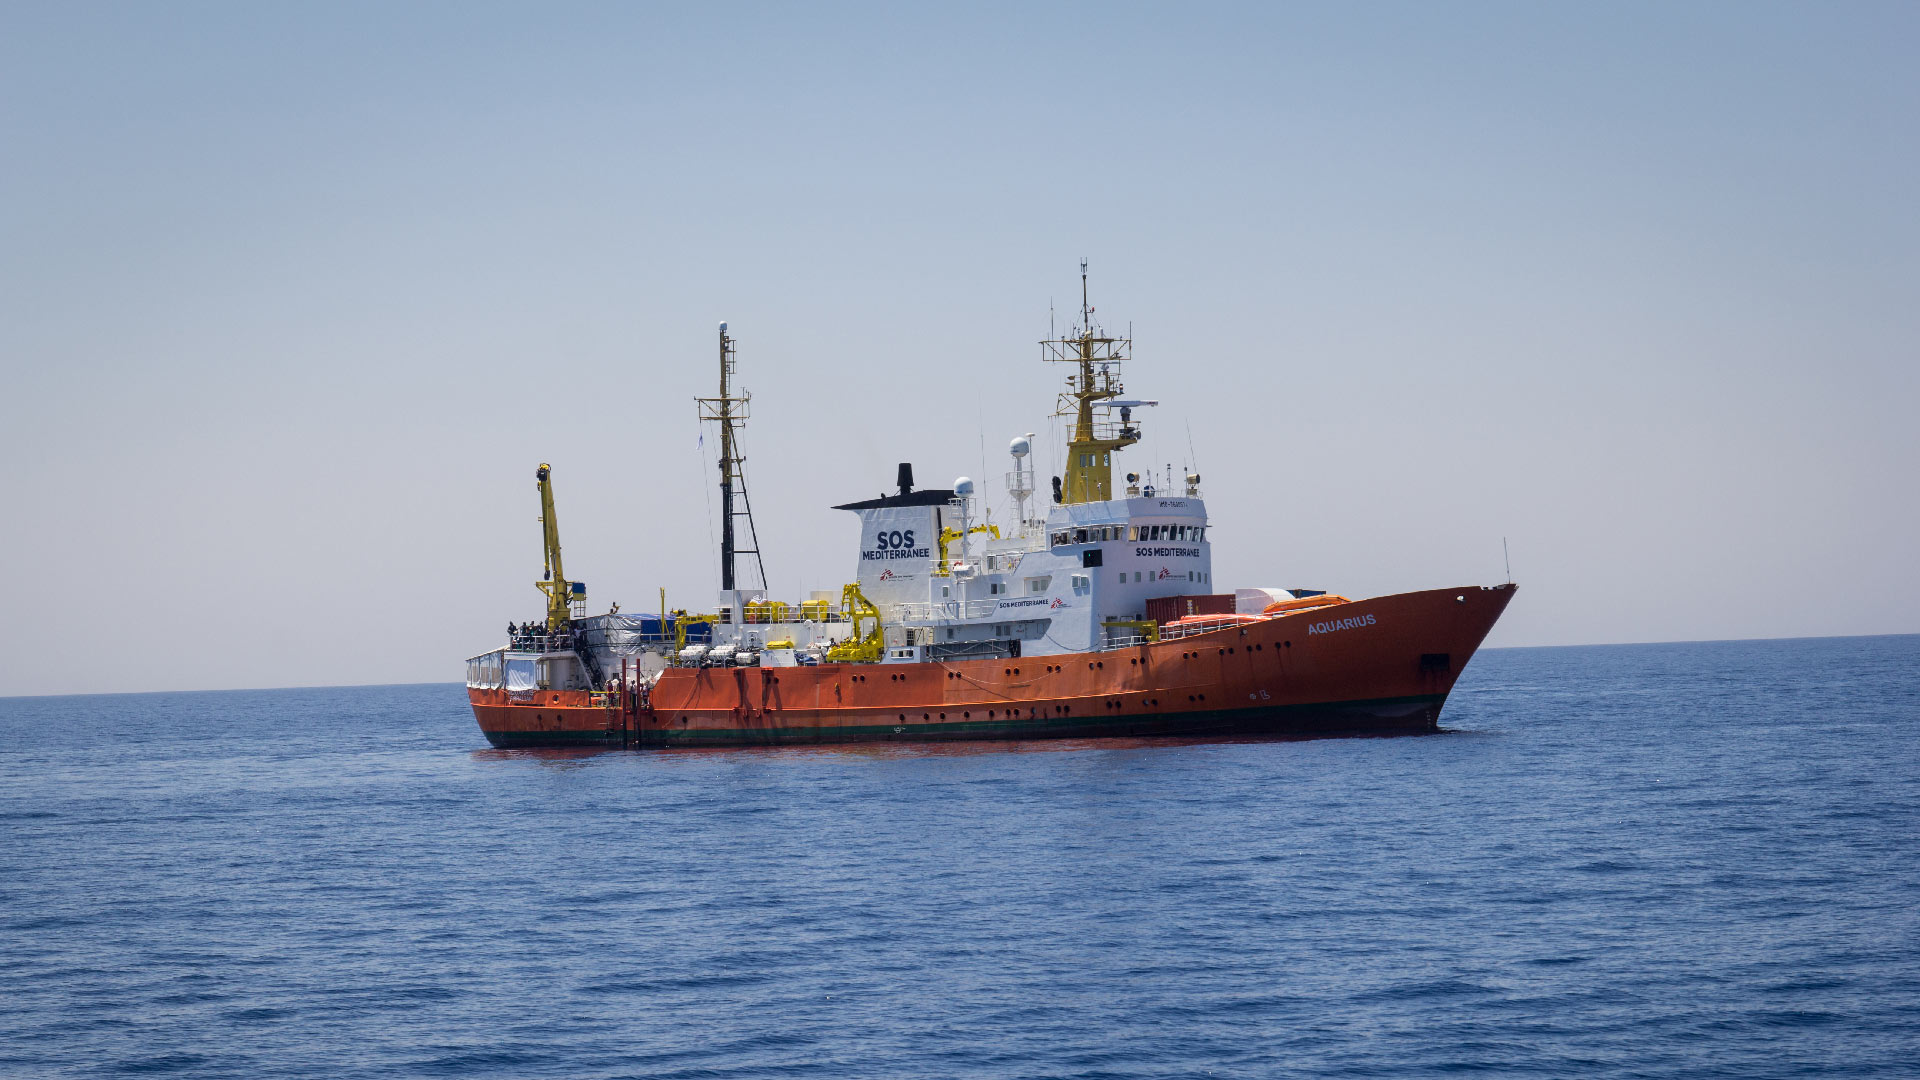 sauvetage-migrants-mediterranee-SAR-aquarius-bertoluzzi-inkyfada